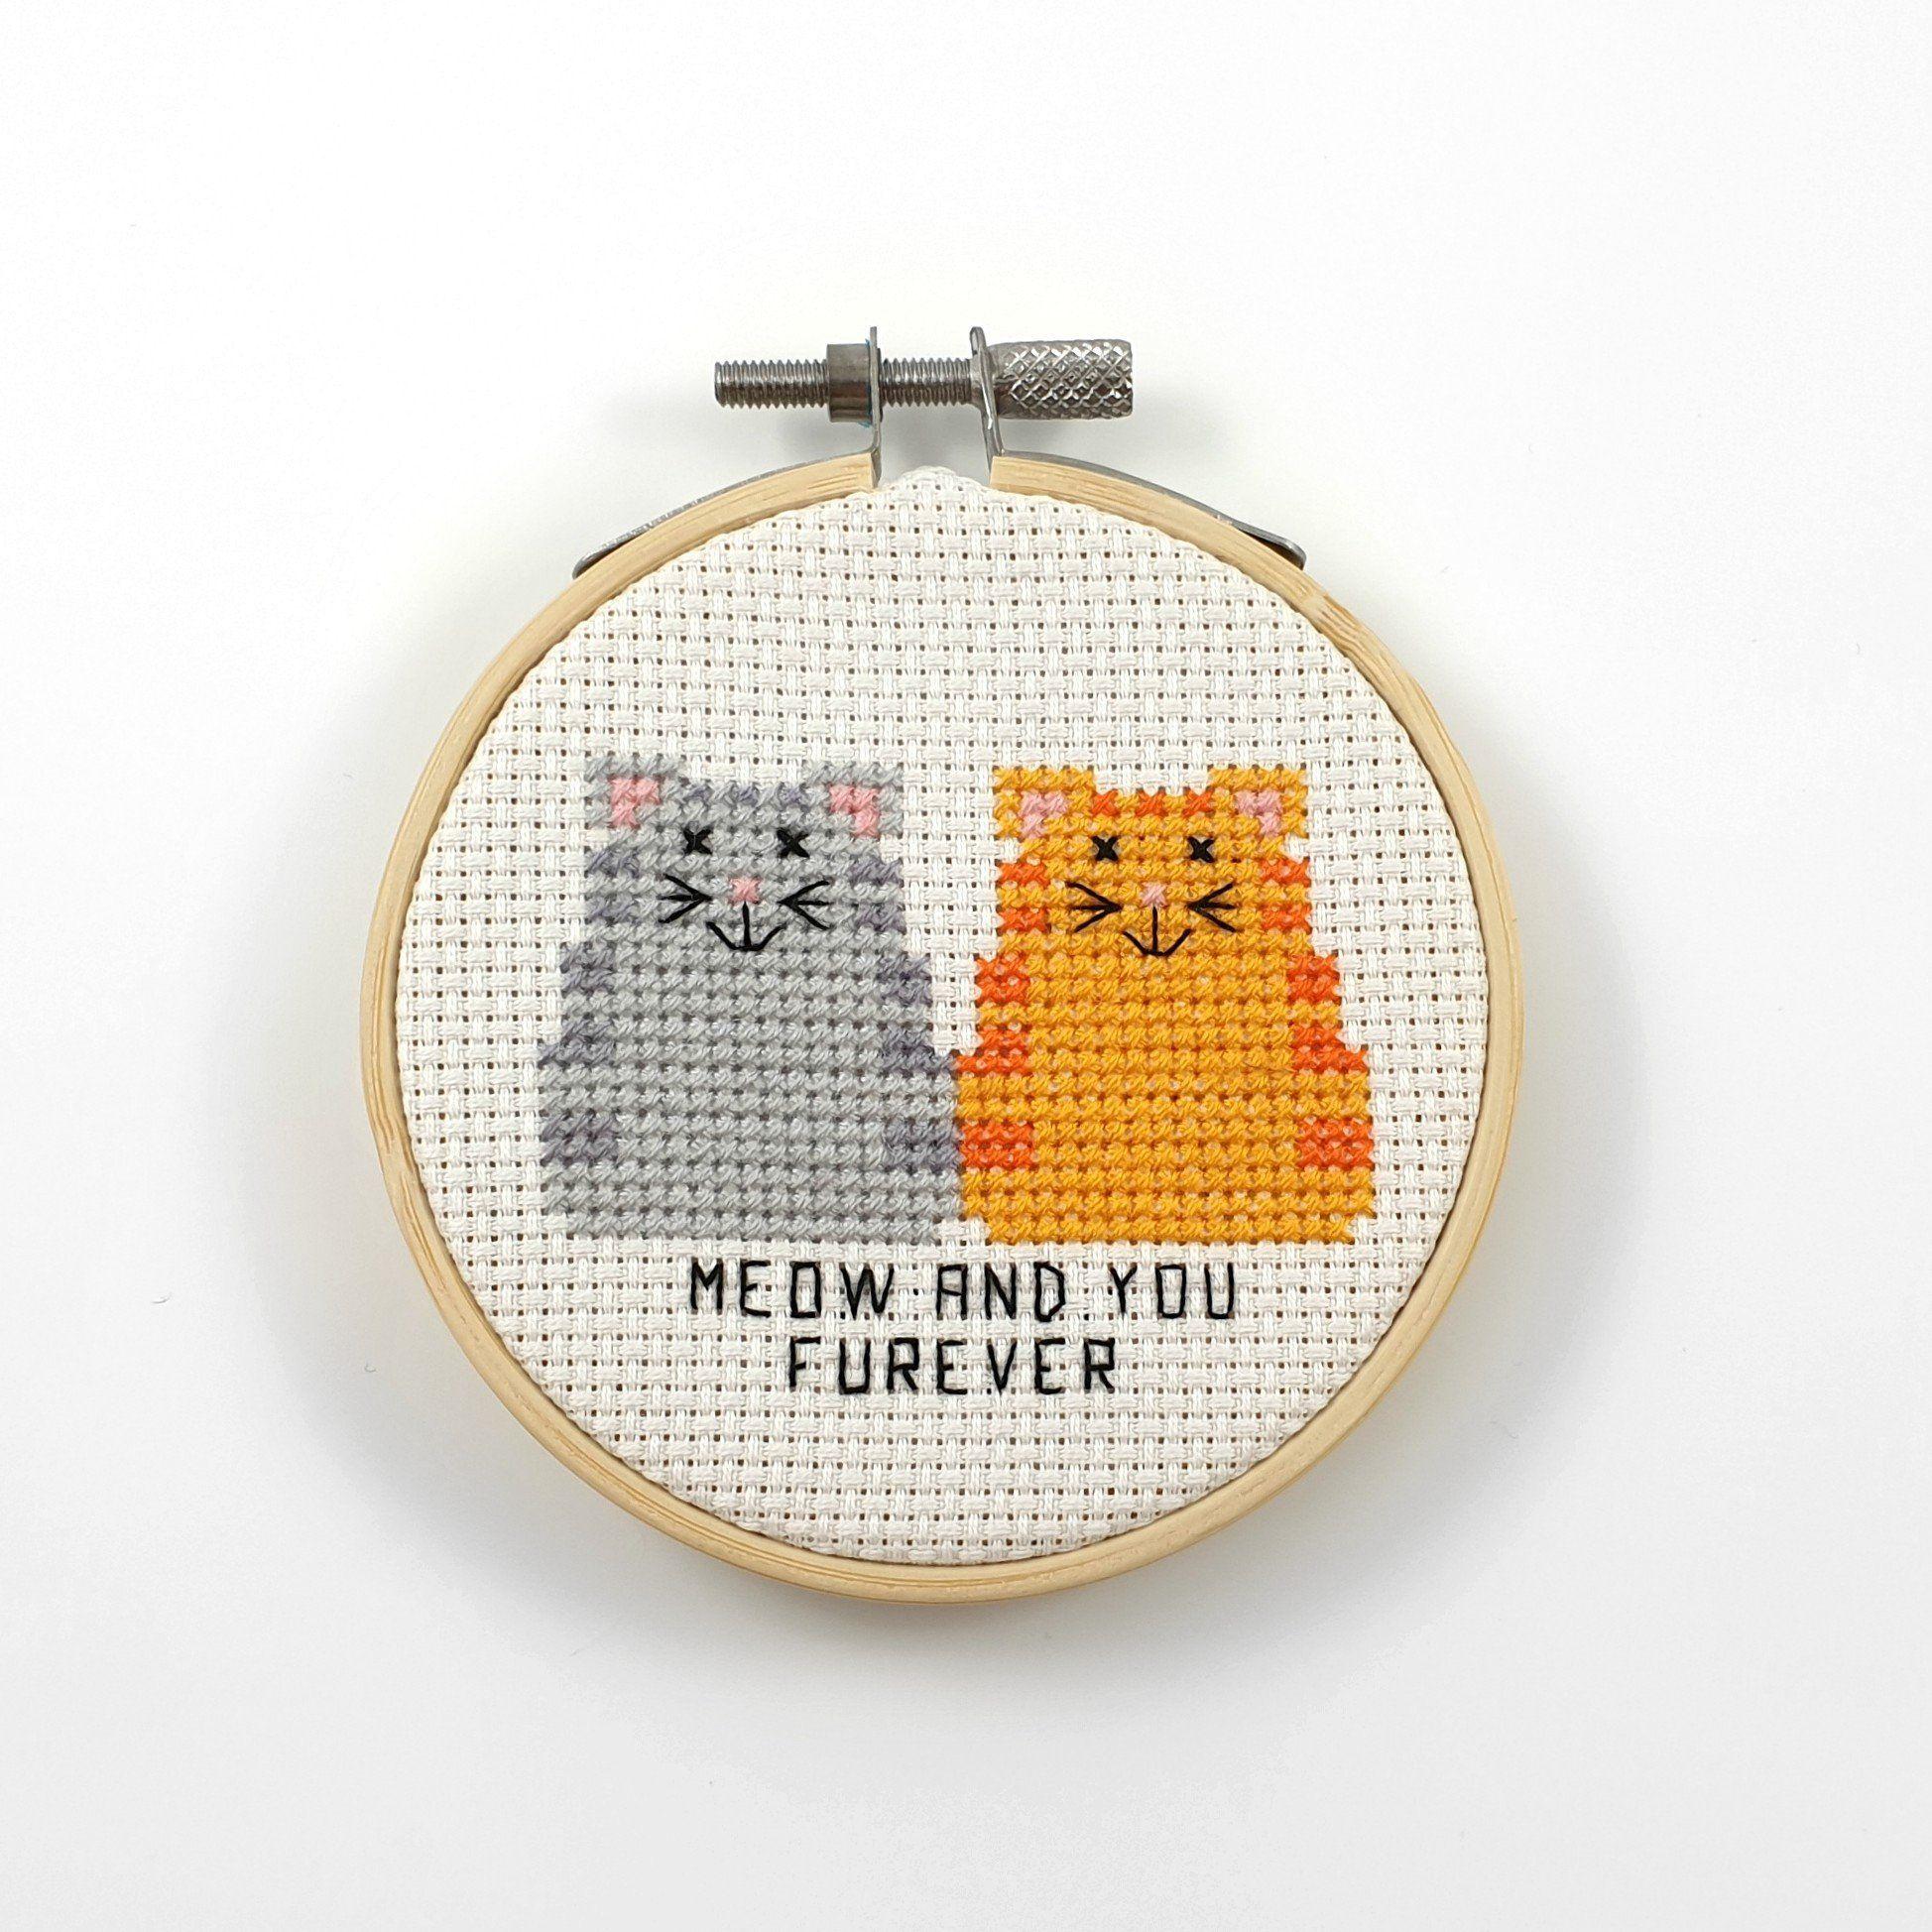 Meow and you furever cross stitch pattern, cat cross stitch